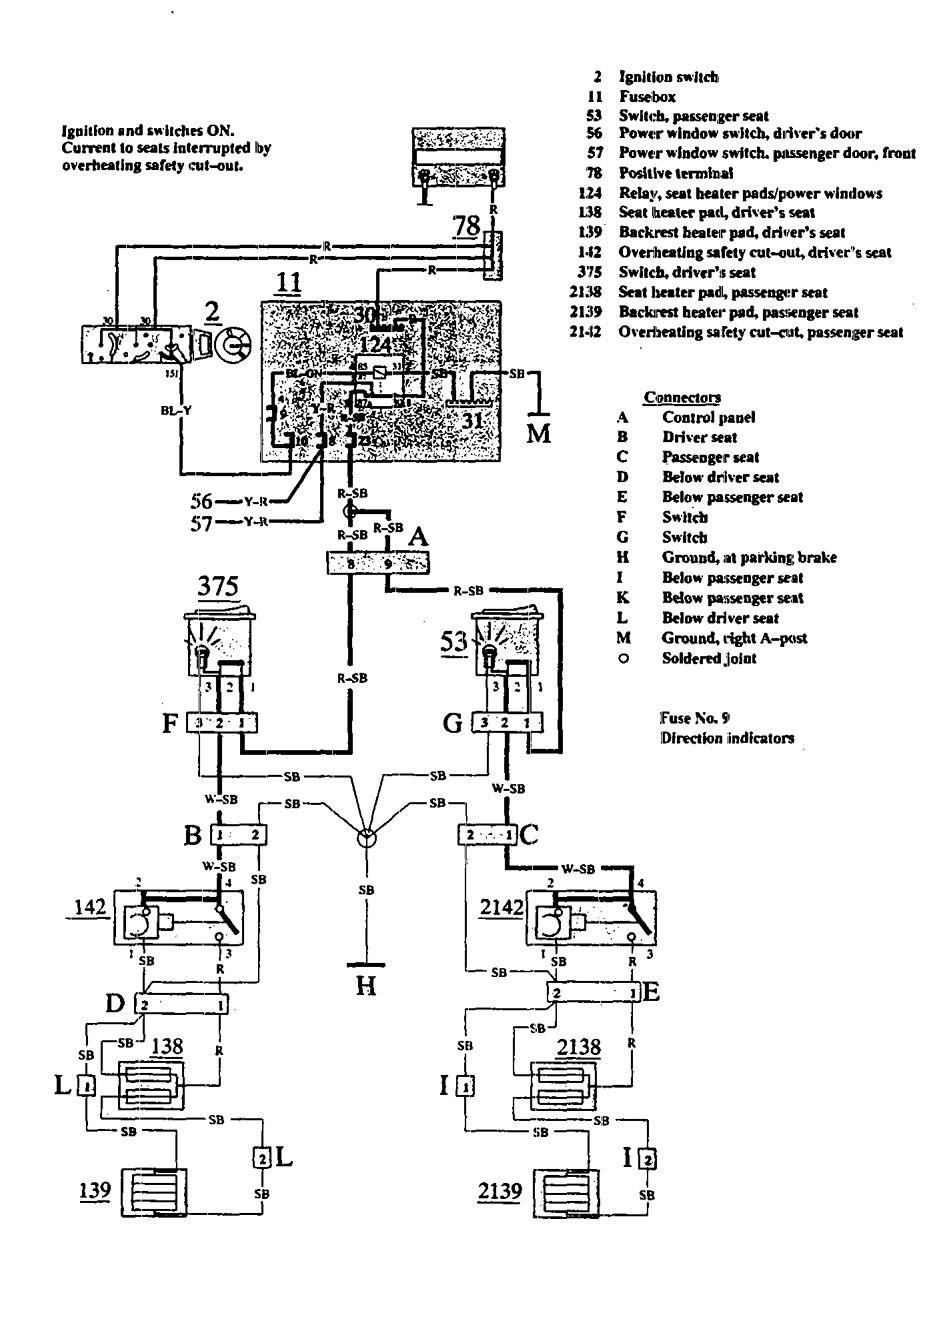 medium resolution of volvo 940 wiring diagram heated seats part 2 volvo